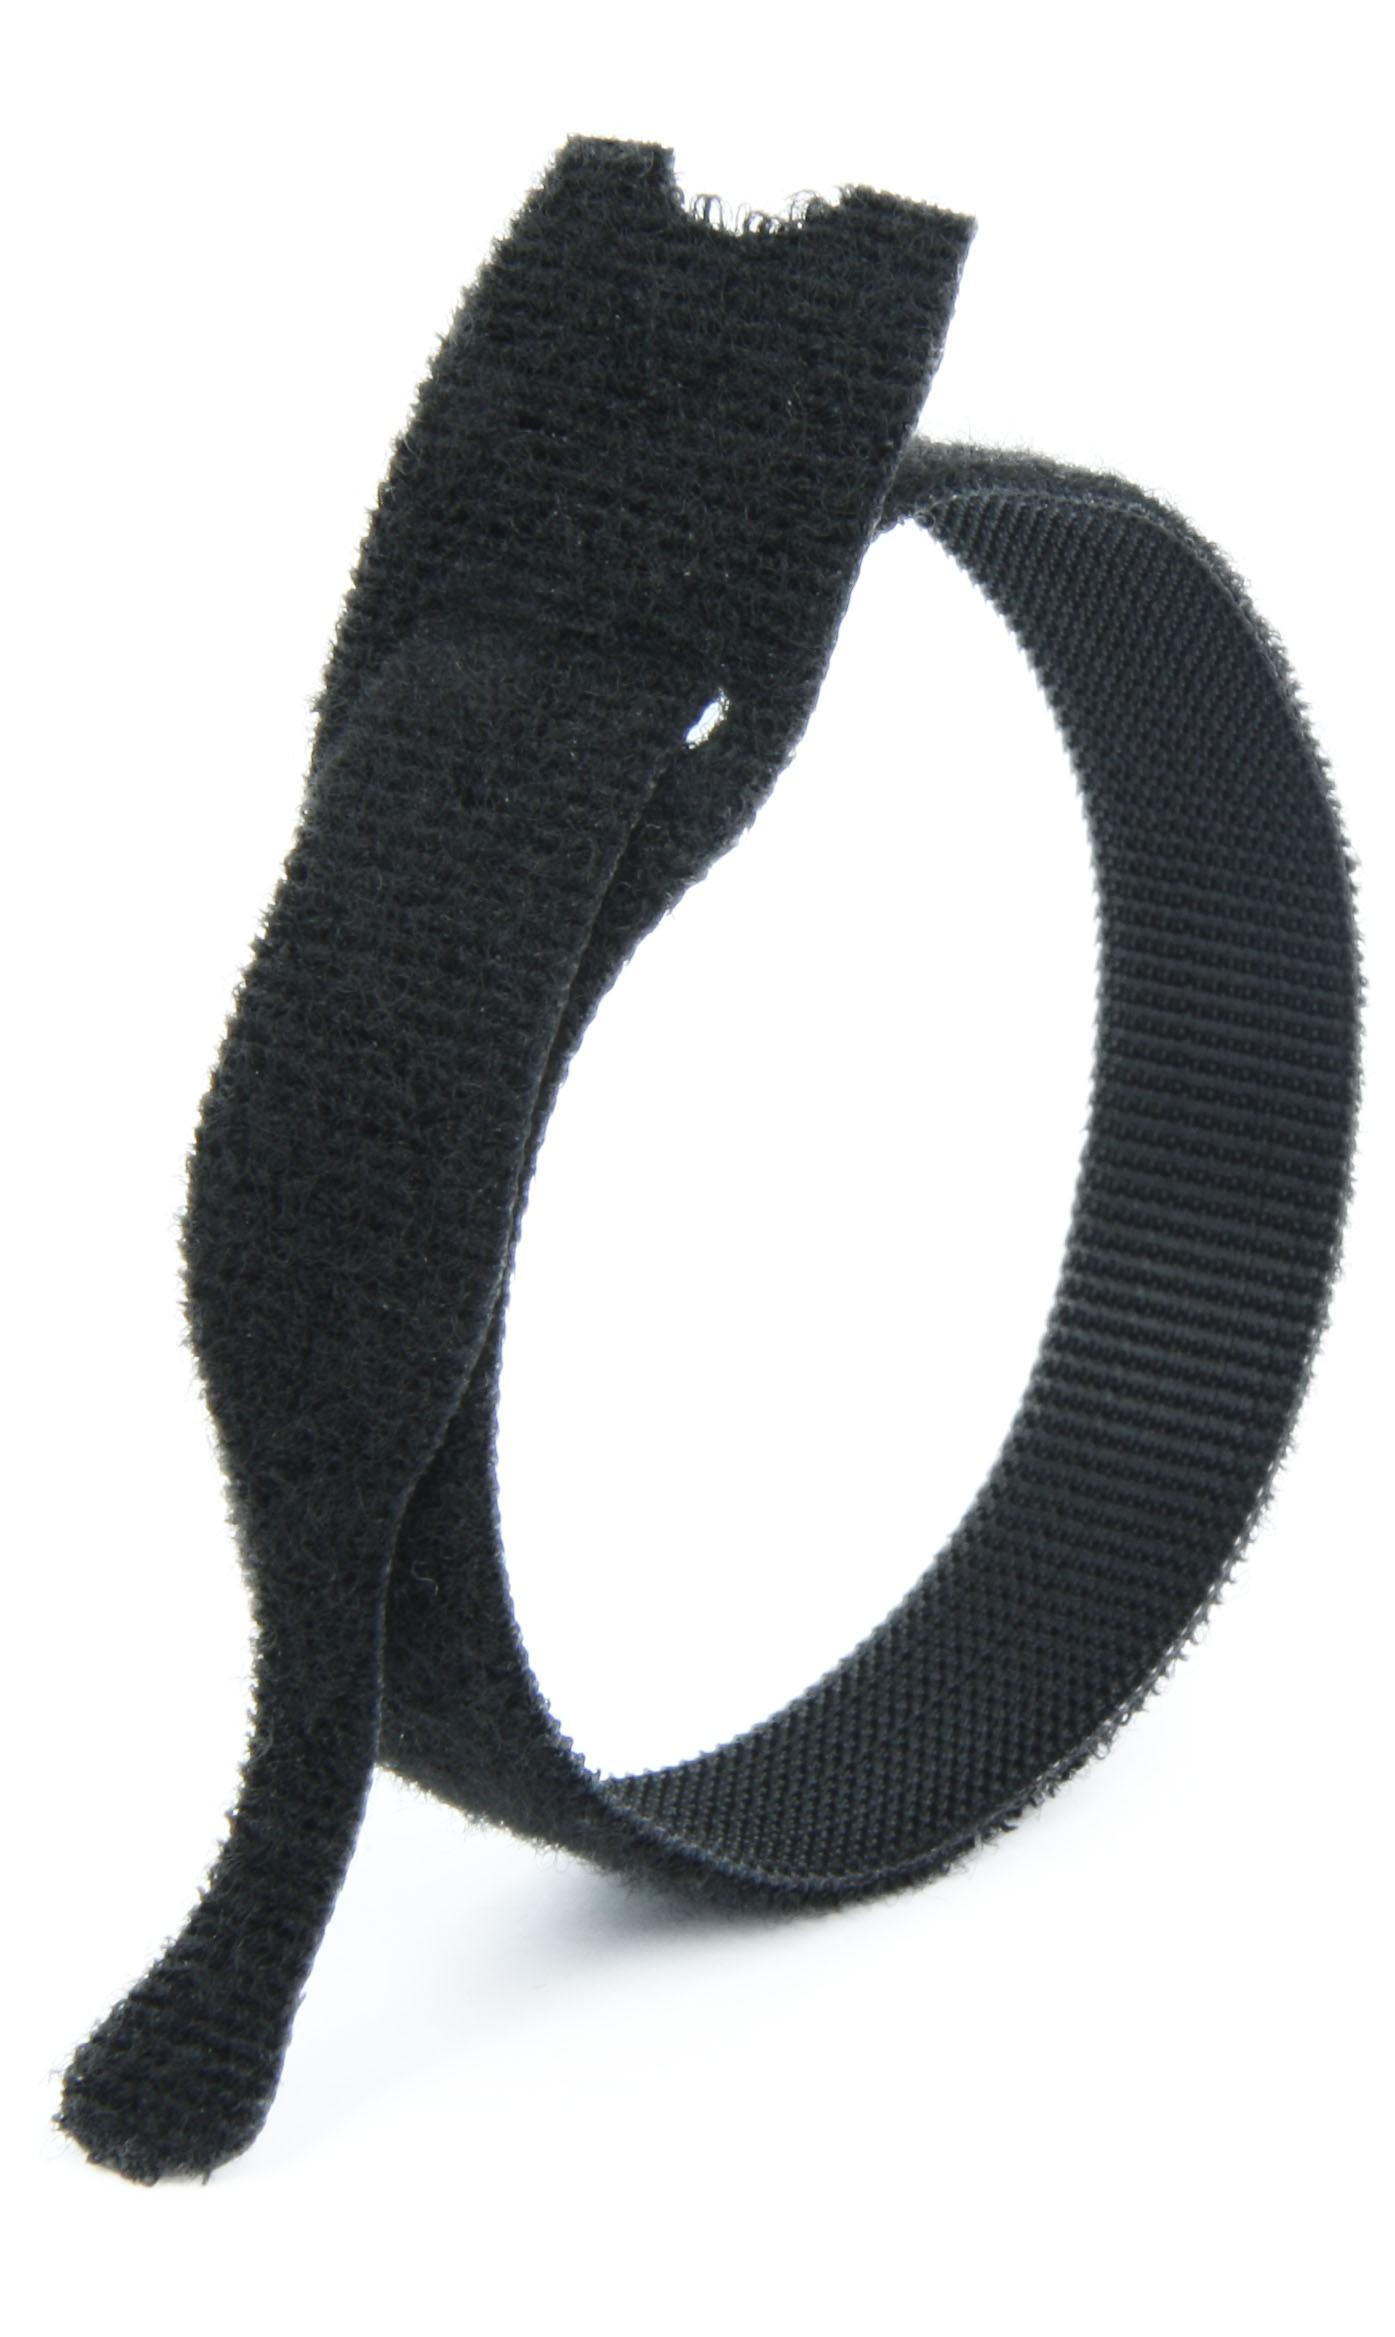 100x Câble Velcro 300 x 25 mm Bleu Câble Velcro Bande Serre-câbles velcro Oeillet